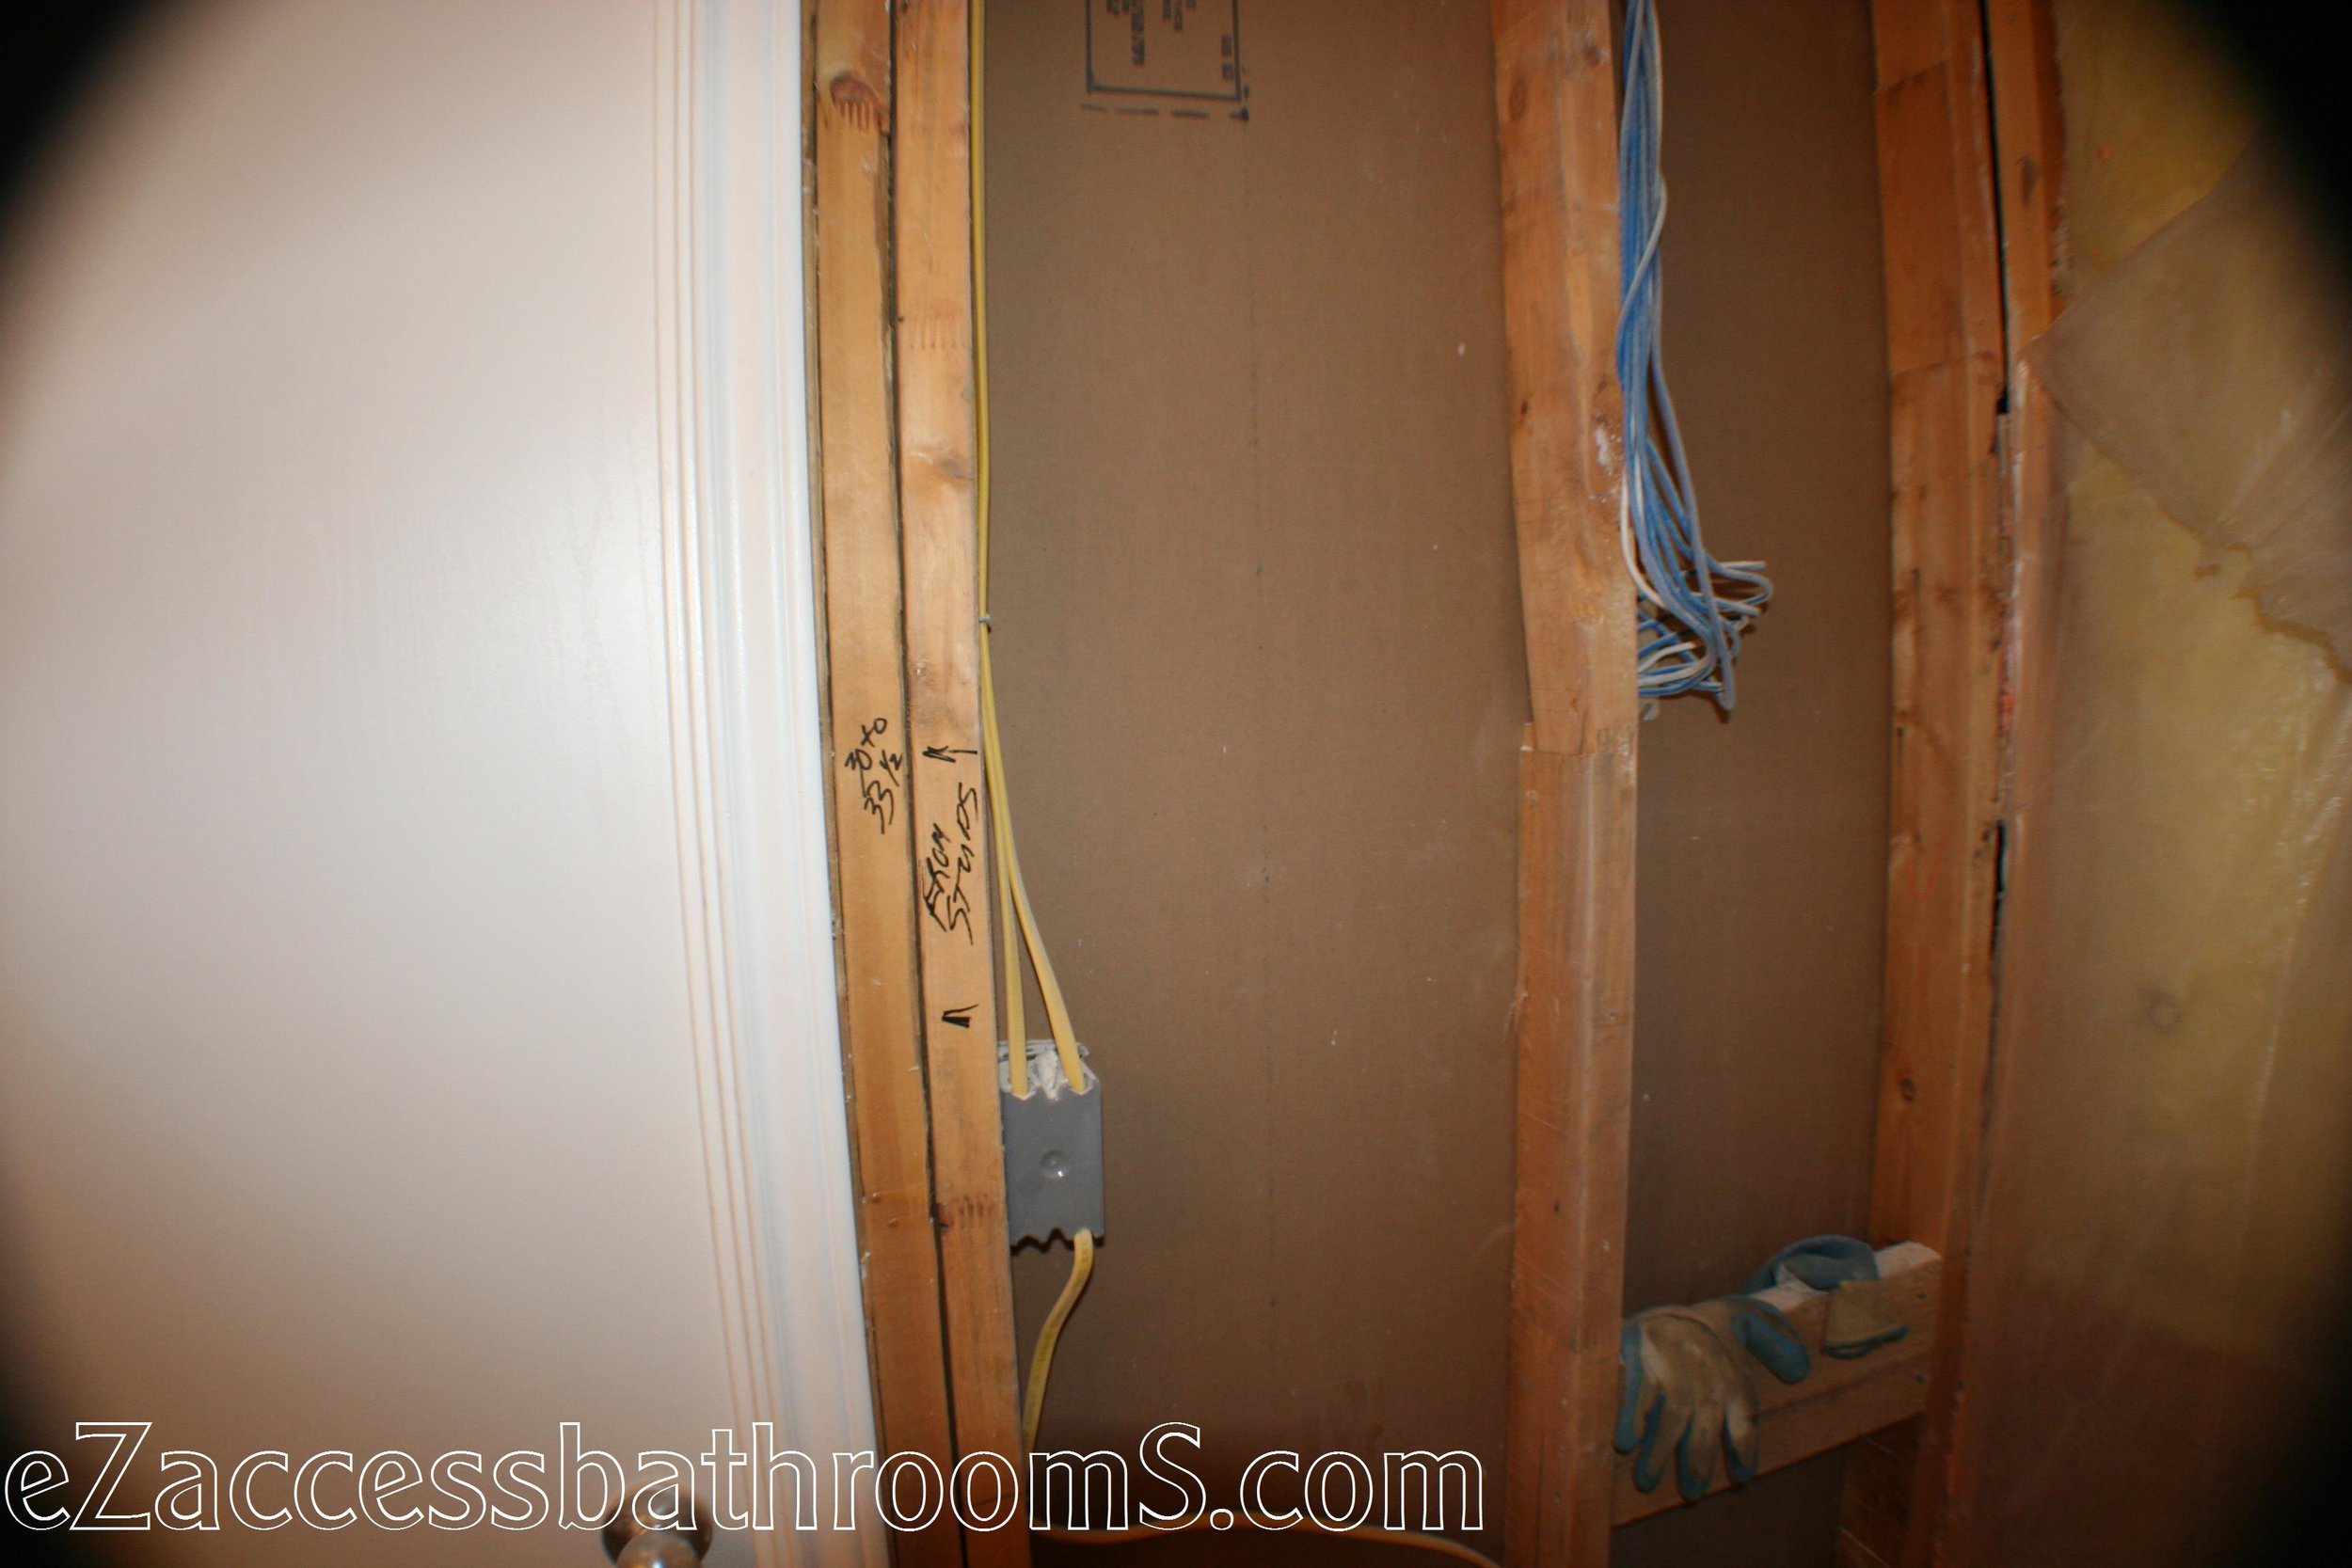 cheap tub to shower conversion ezaccessbathrooms.com 014.JPG